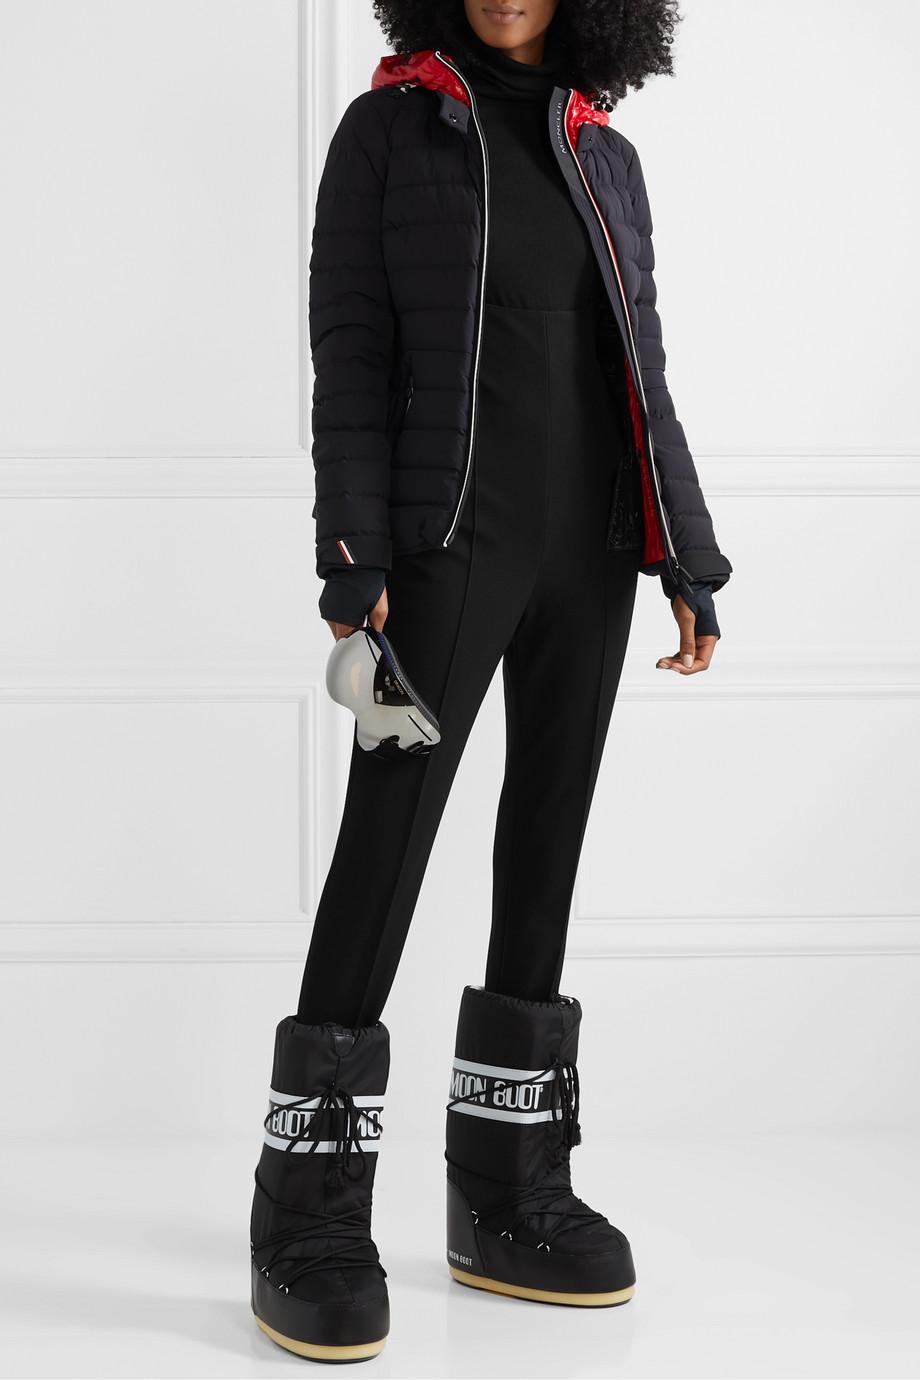 Moncler Grenoble Stirrup twill ski suit